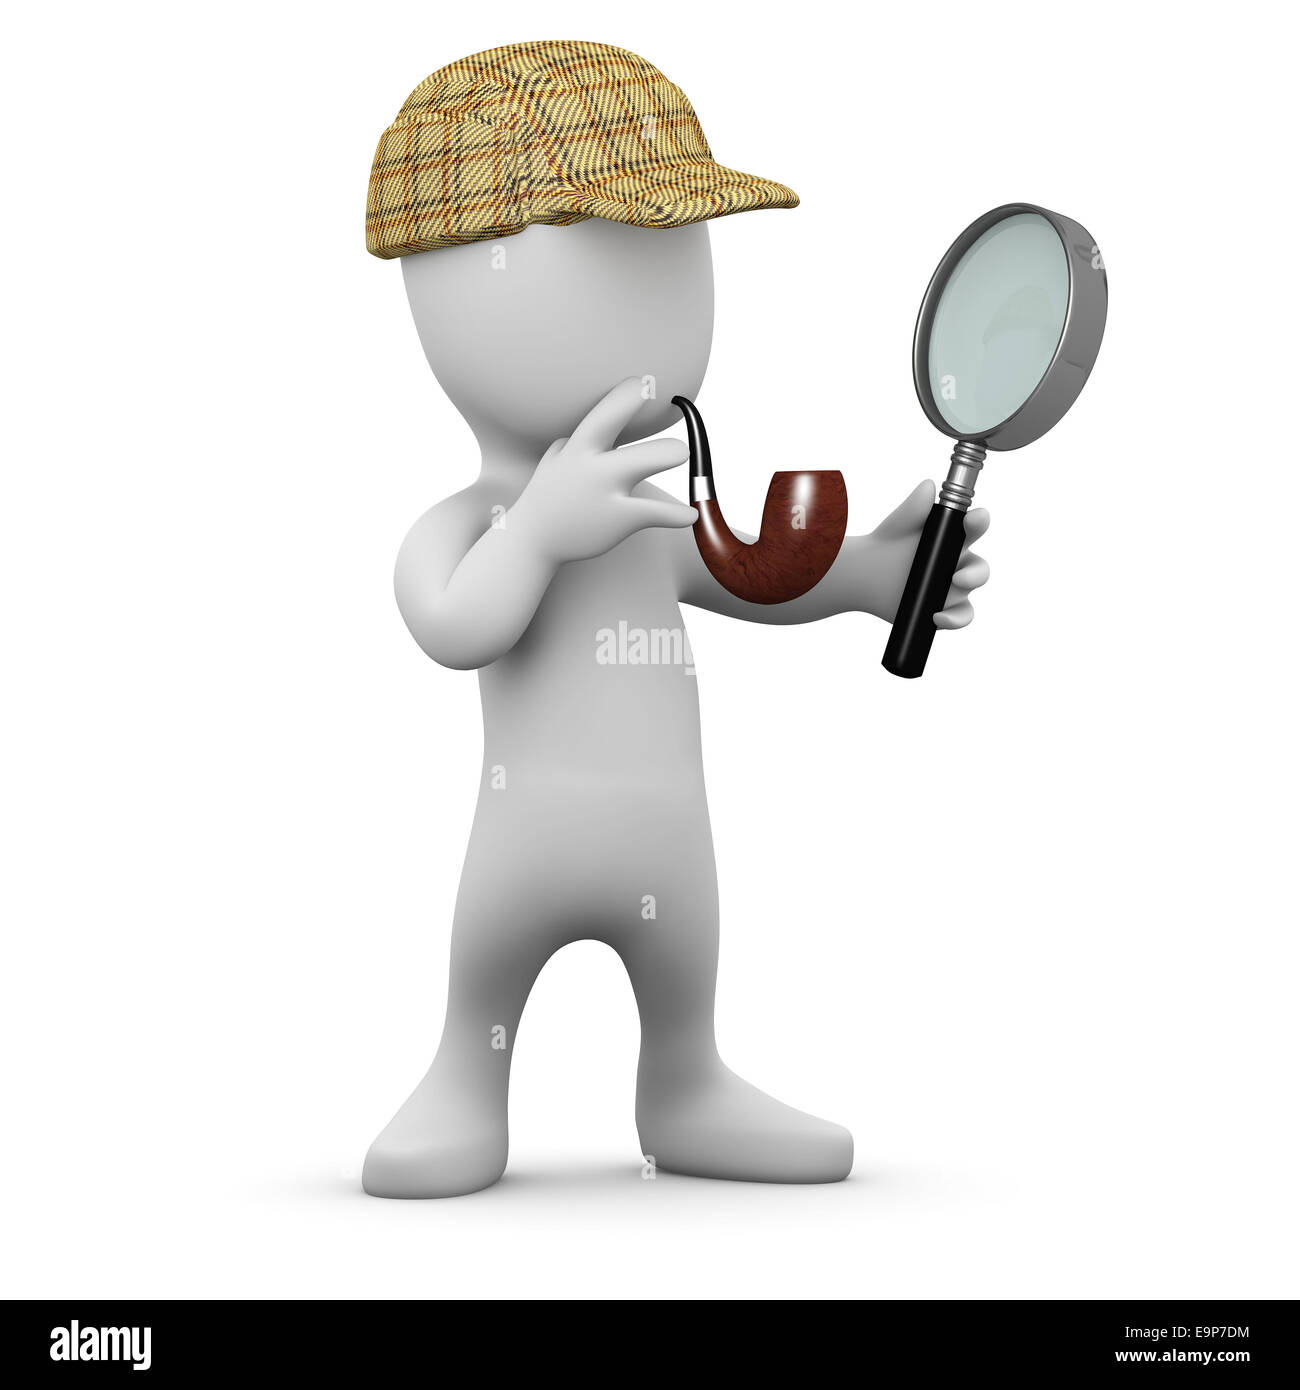 d5ac951fc Deerstalker Sherlock Hat Magnifying Glass Stock Photos & Deerstalker ...